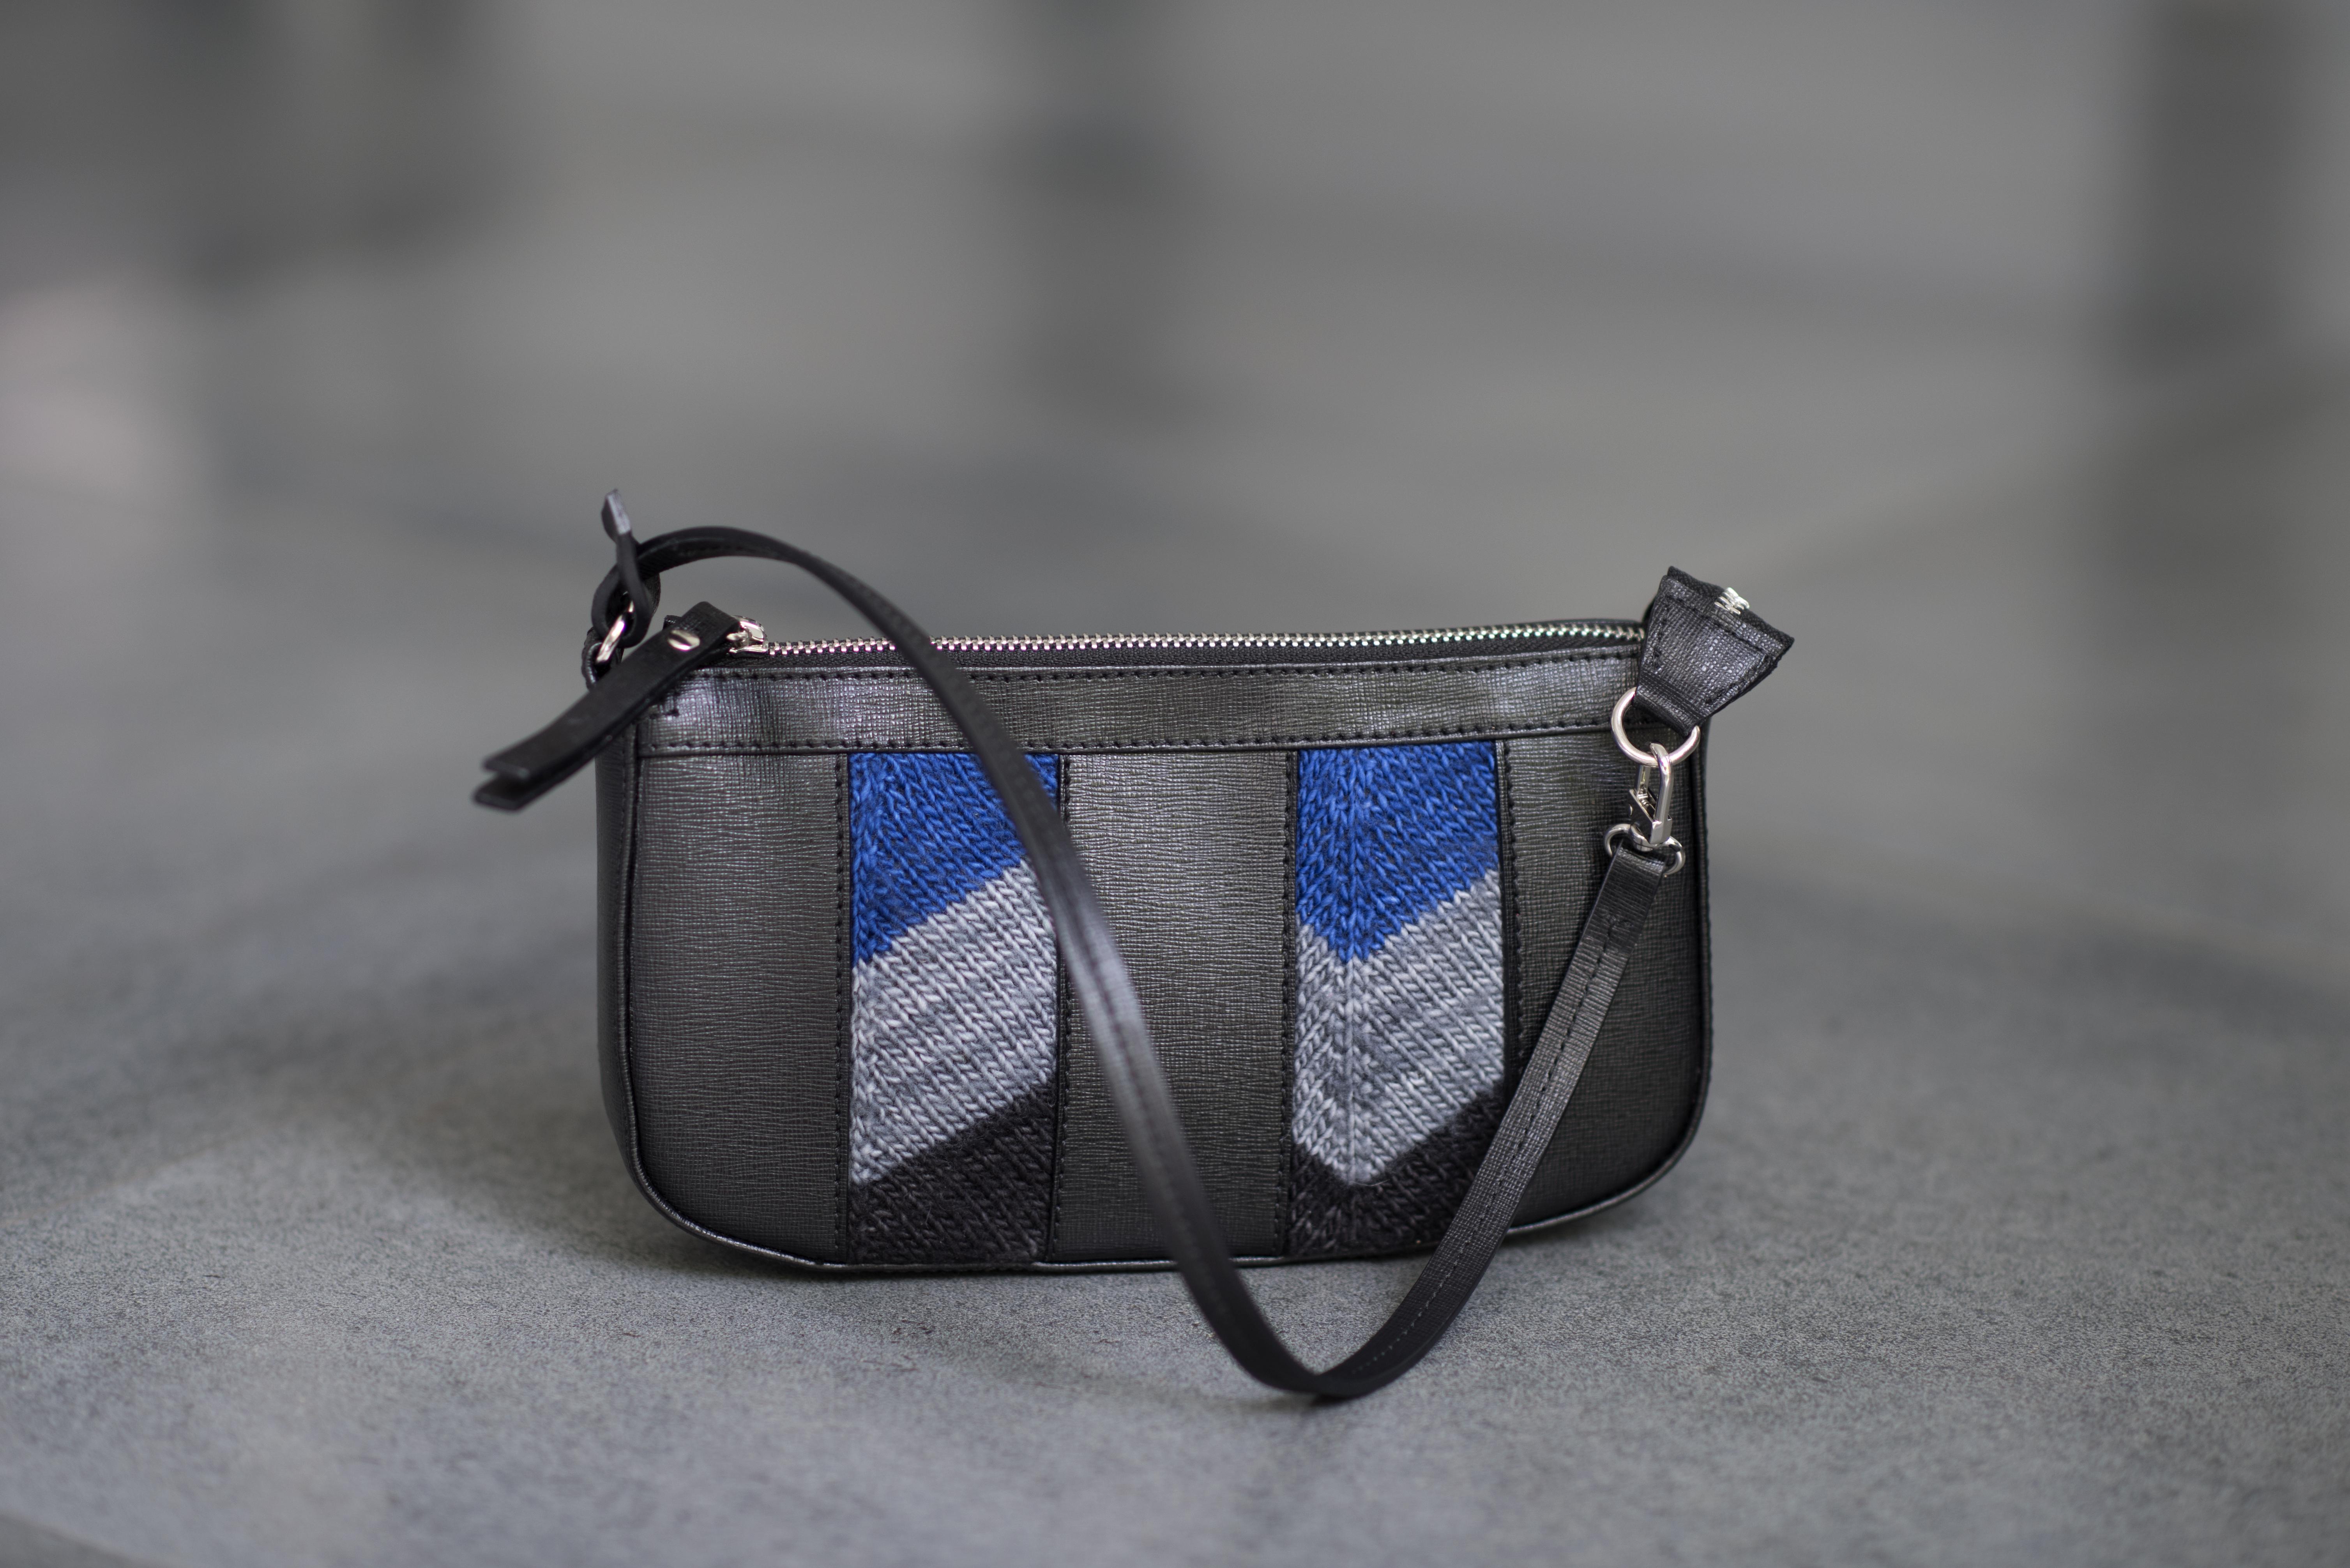 Mim & Ray bags